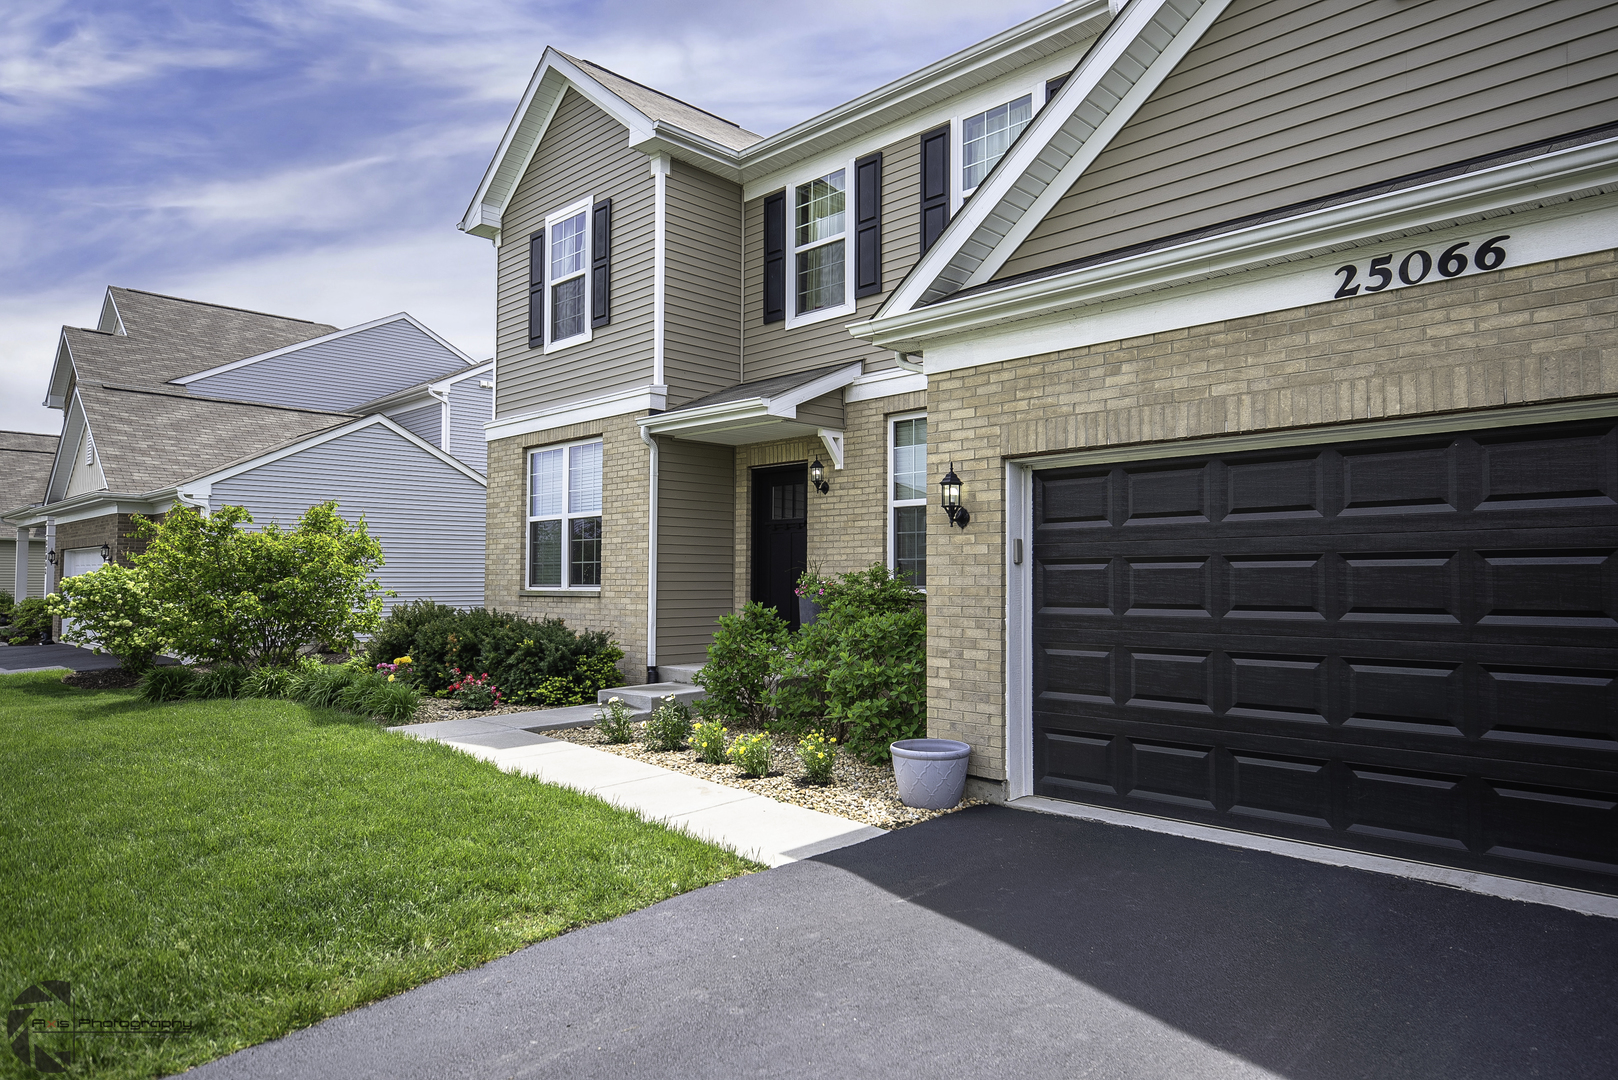 25066 Thornberry Drive Plainfield Illinois